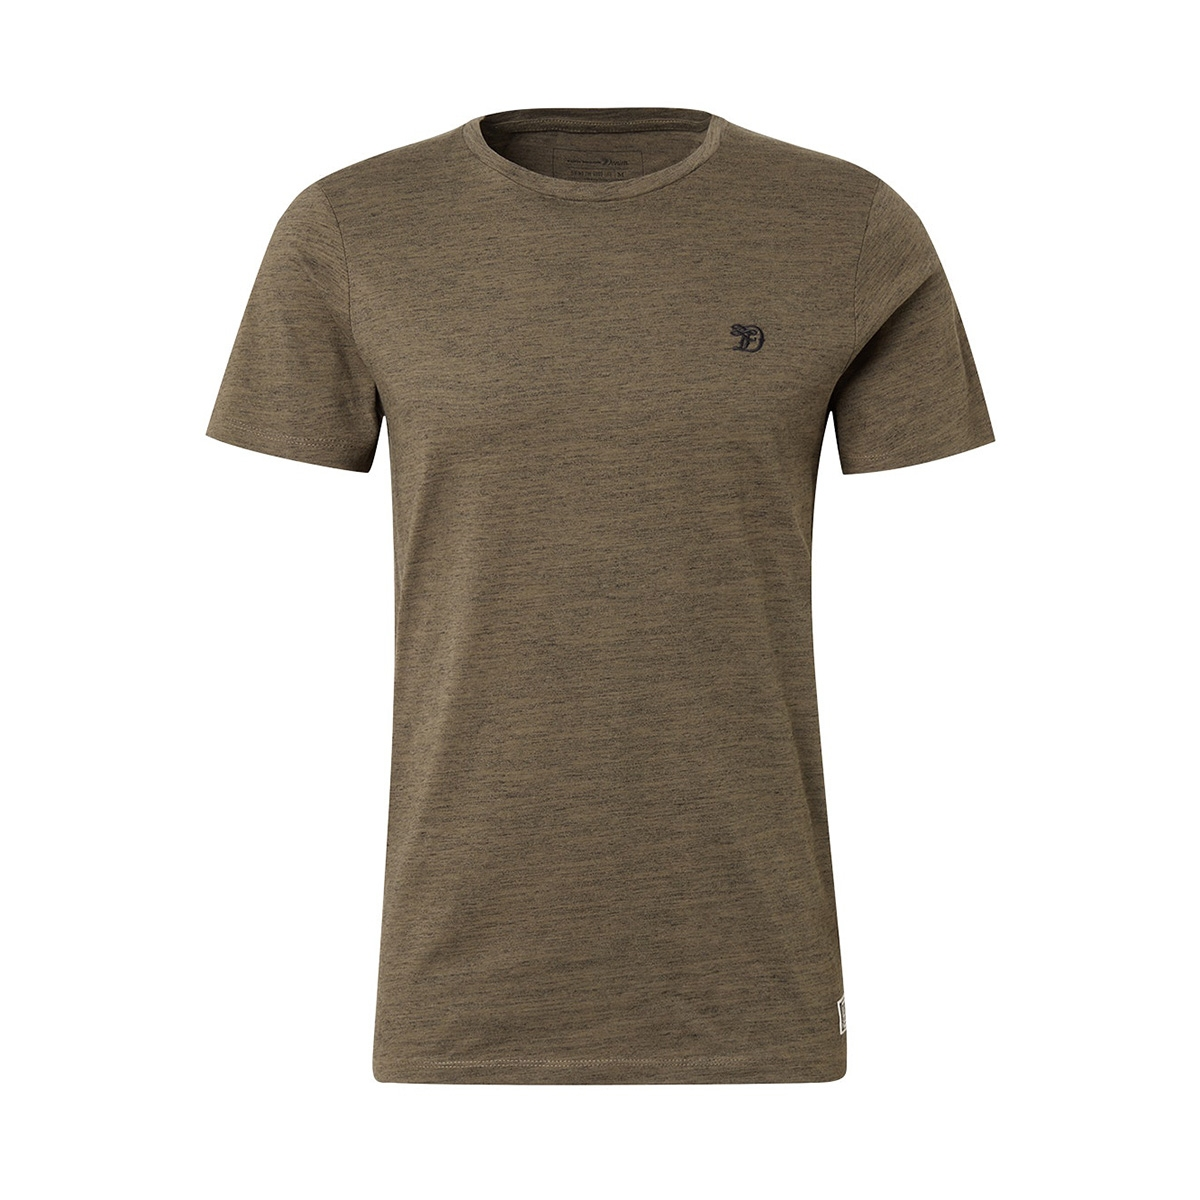 1009207xx12 tom tailor t-shirt 16437